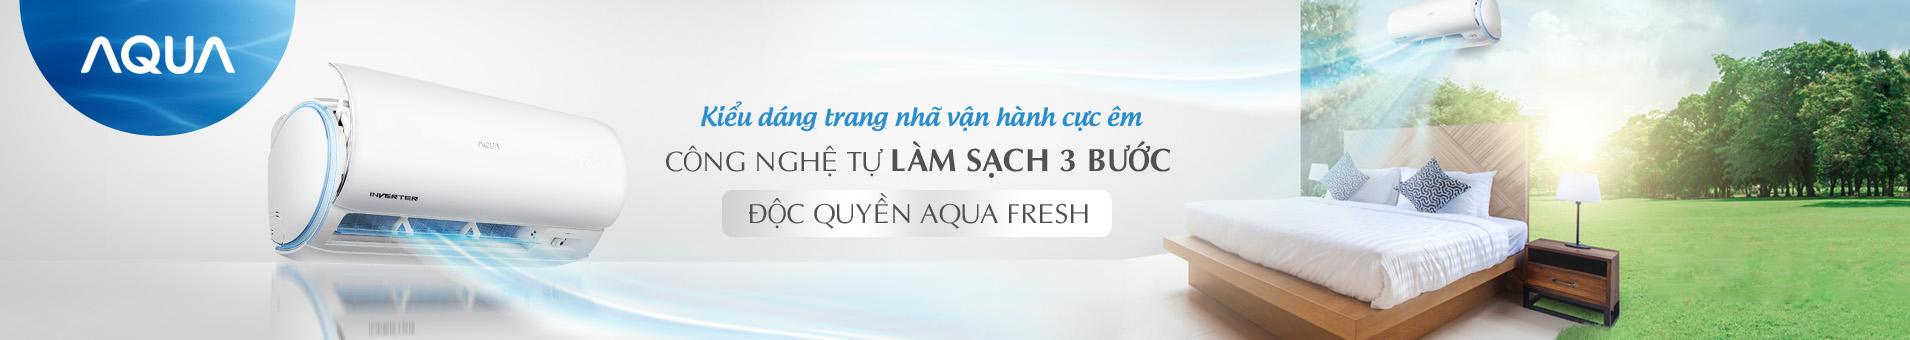 Máy lạnh Sanyo Aqua - Điều hòa Sanyo Aqua